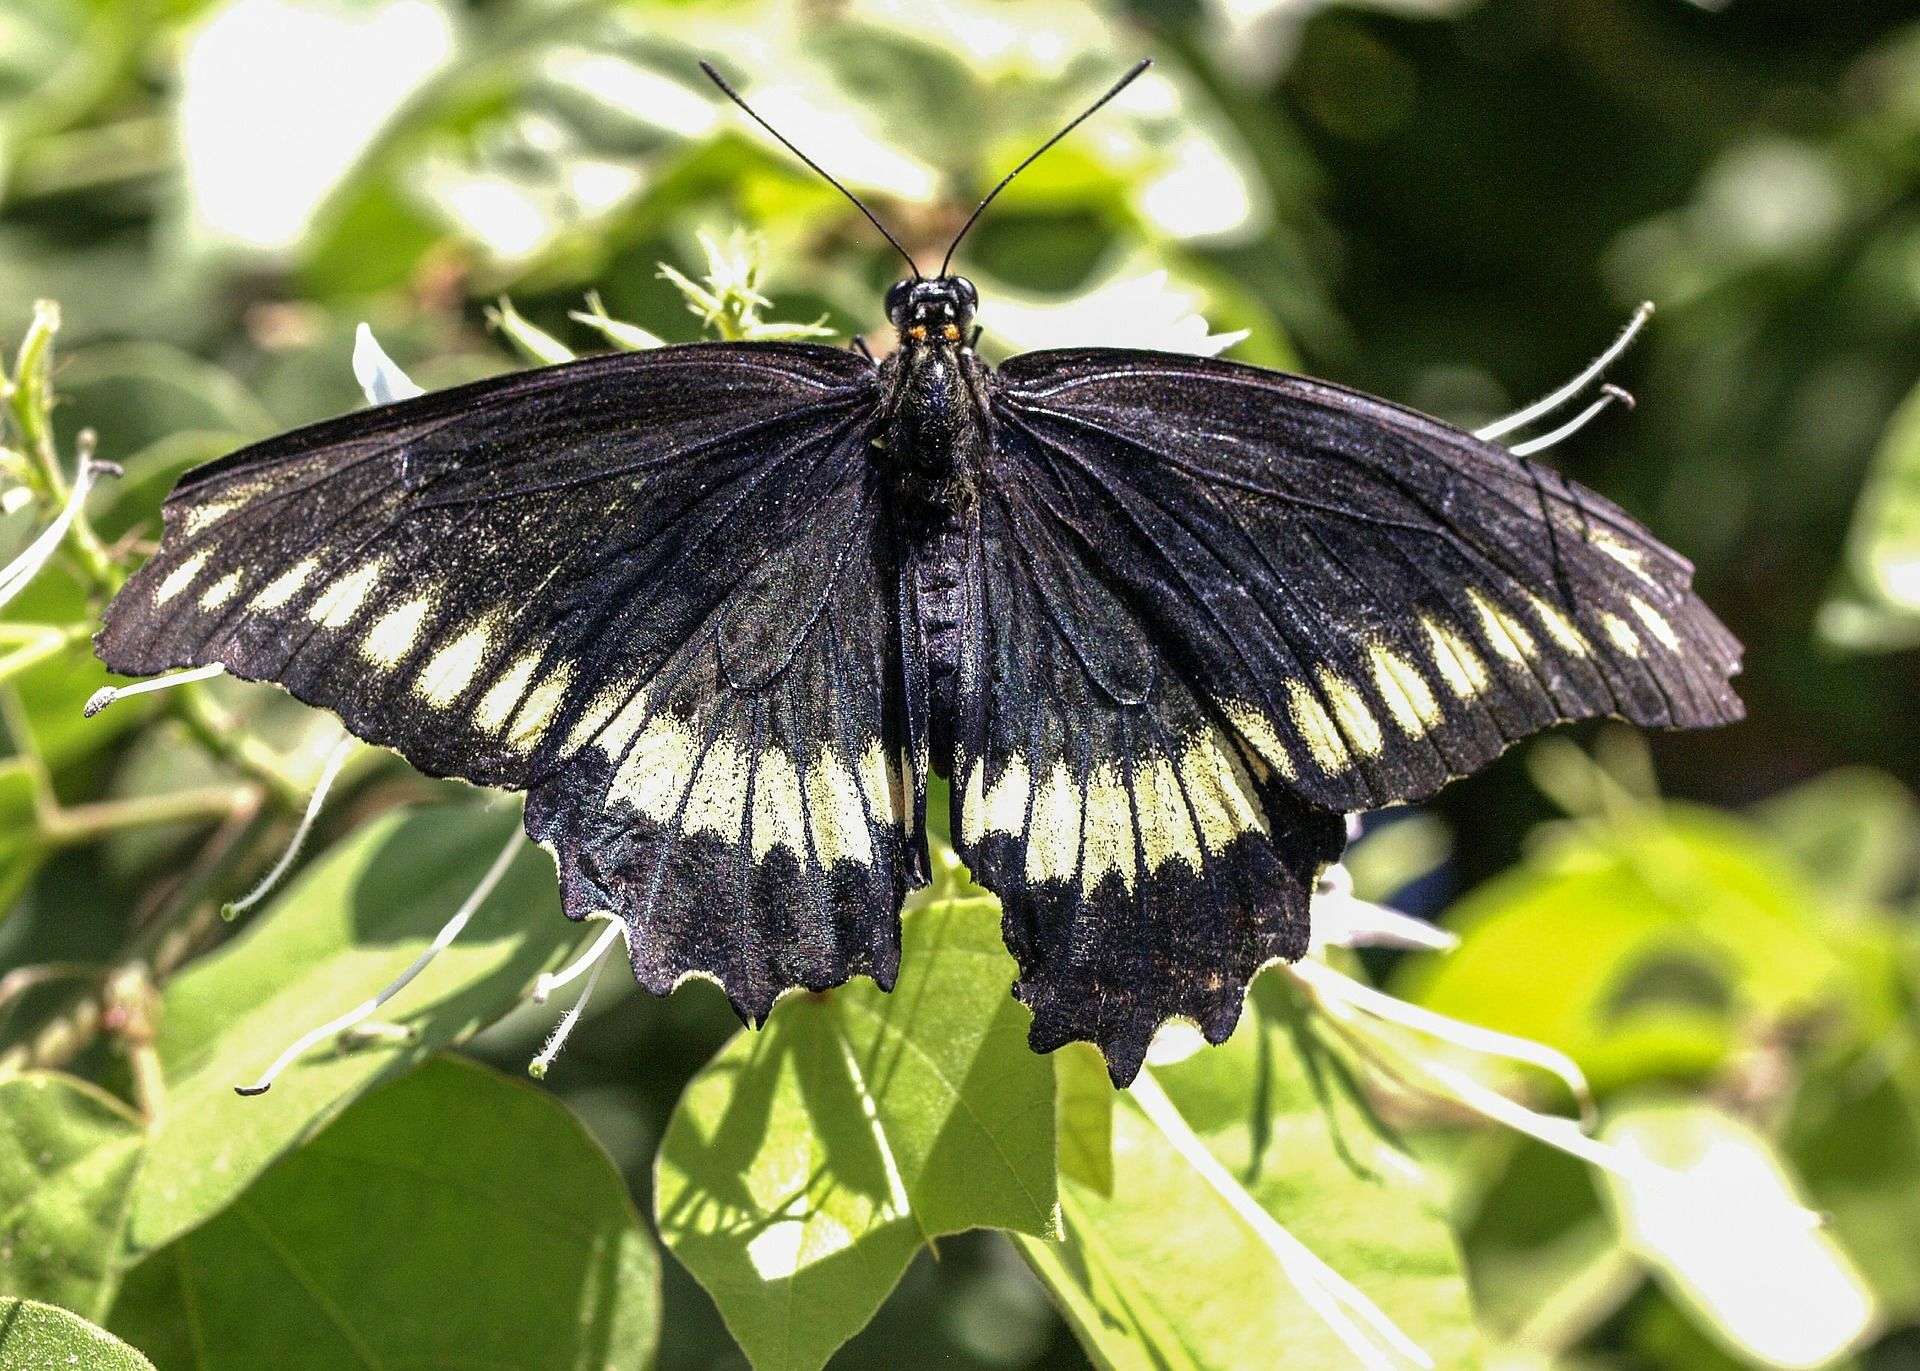 Фото черной бабочки с пятнами онлайн